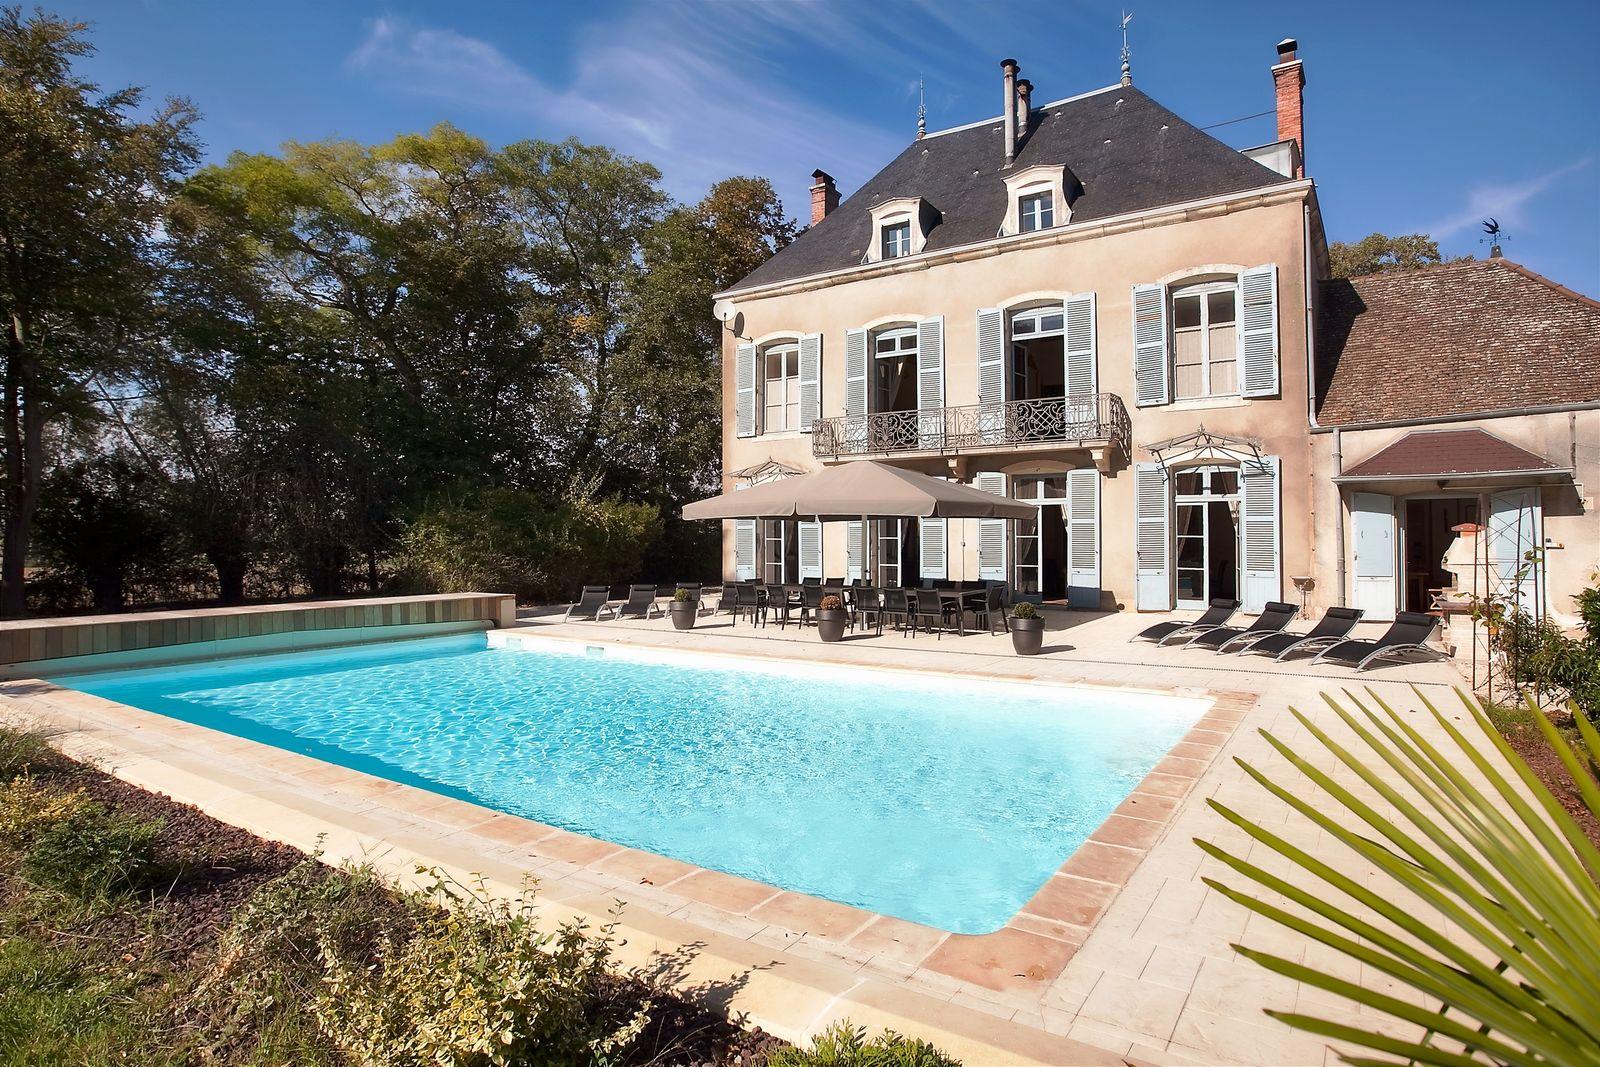 Afbeelding van Château le Kastel - luxe kasteelvakantie Frankrijk